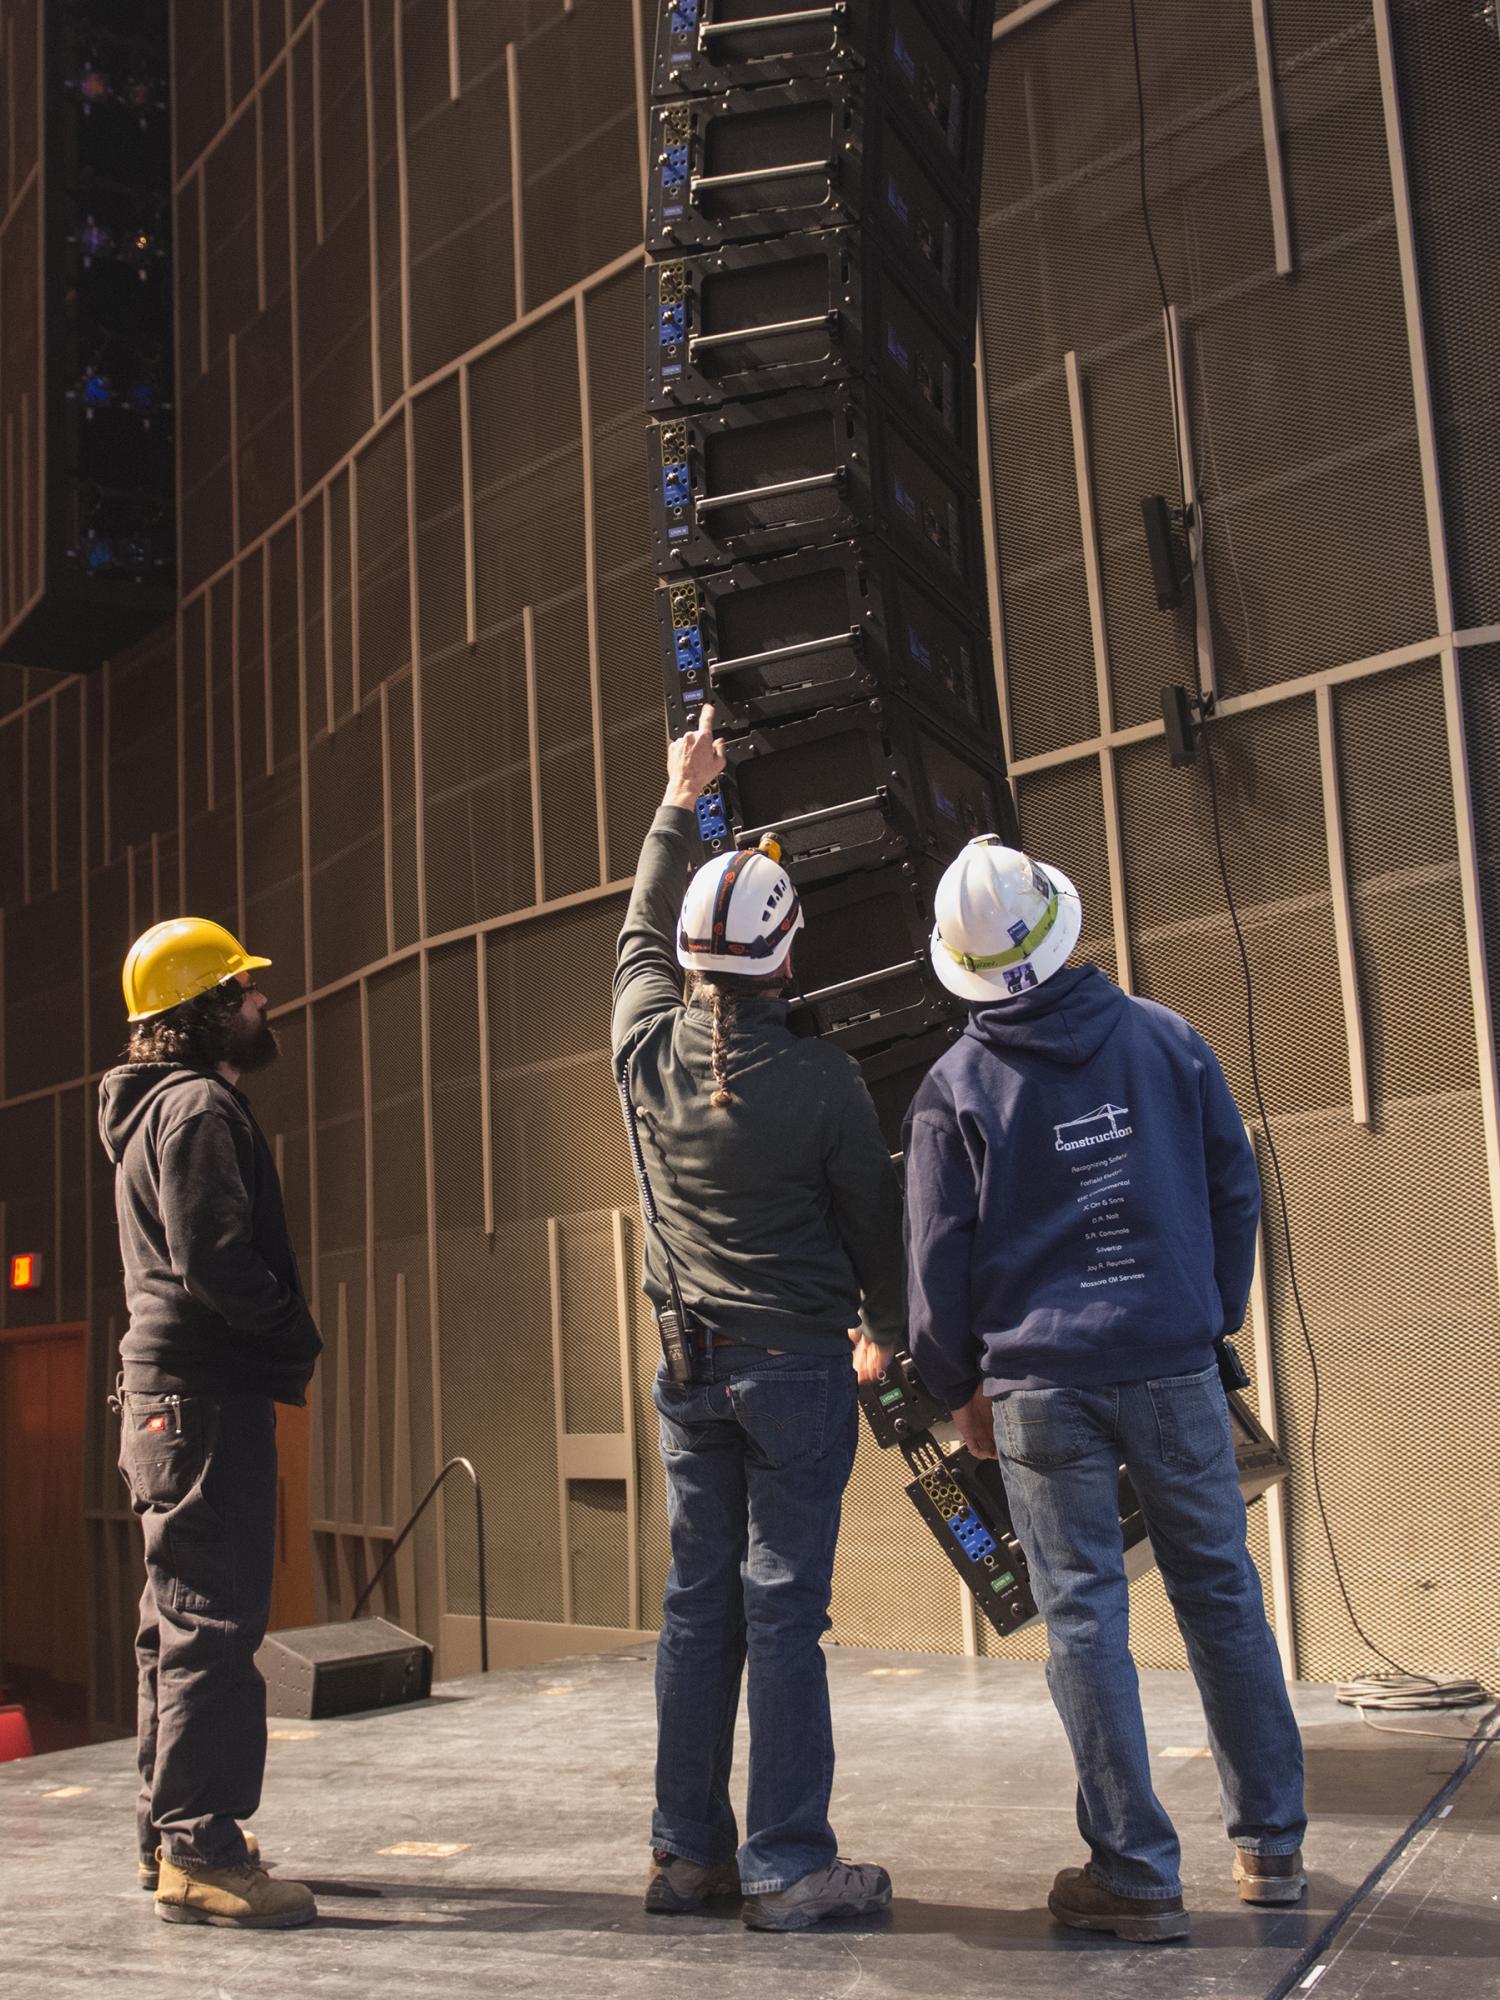 Raising speakers into place